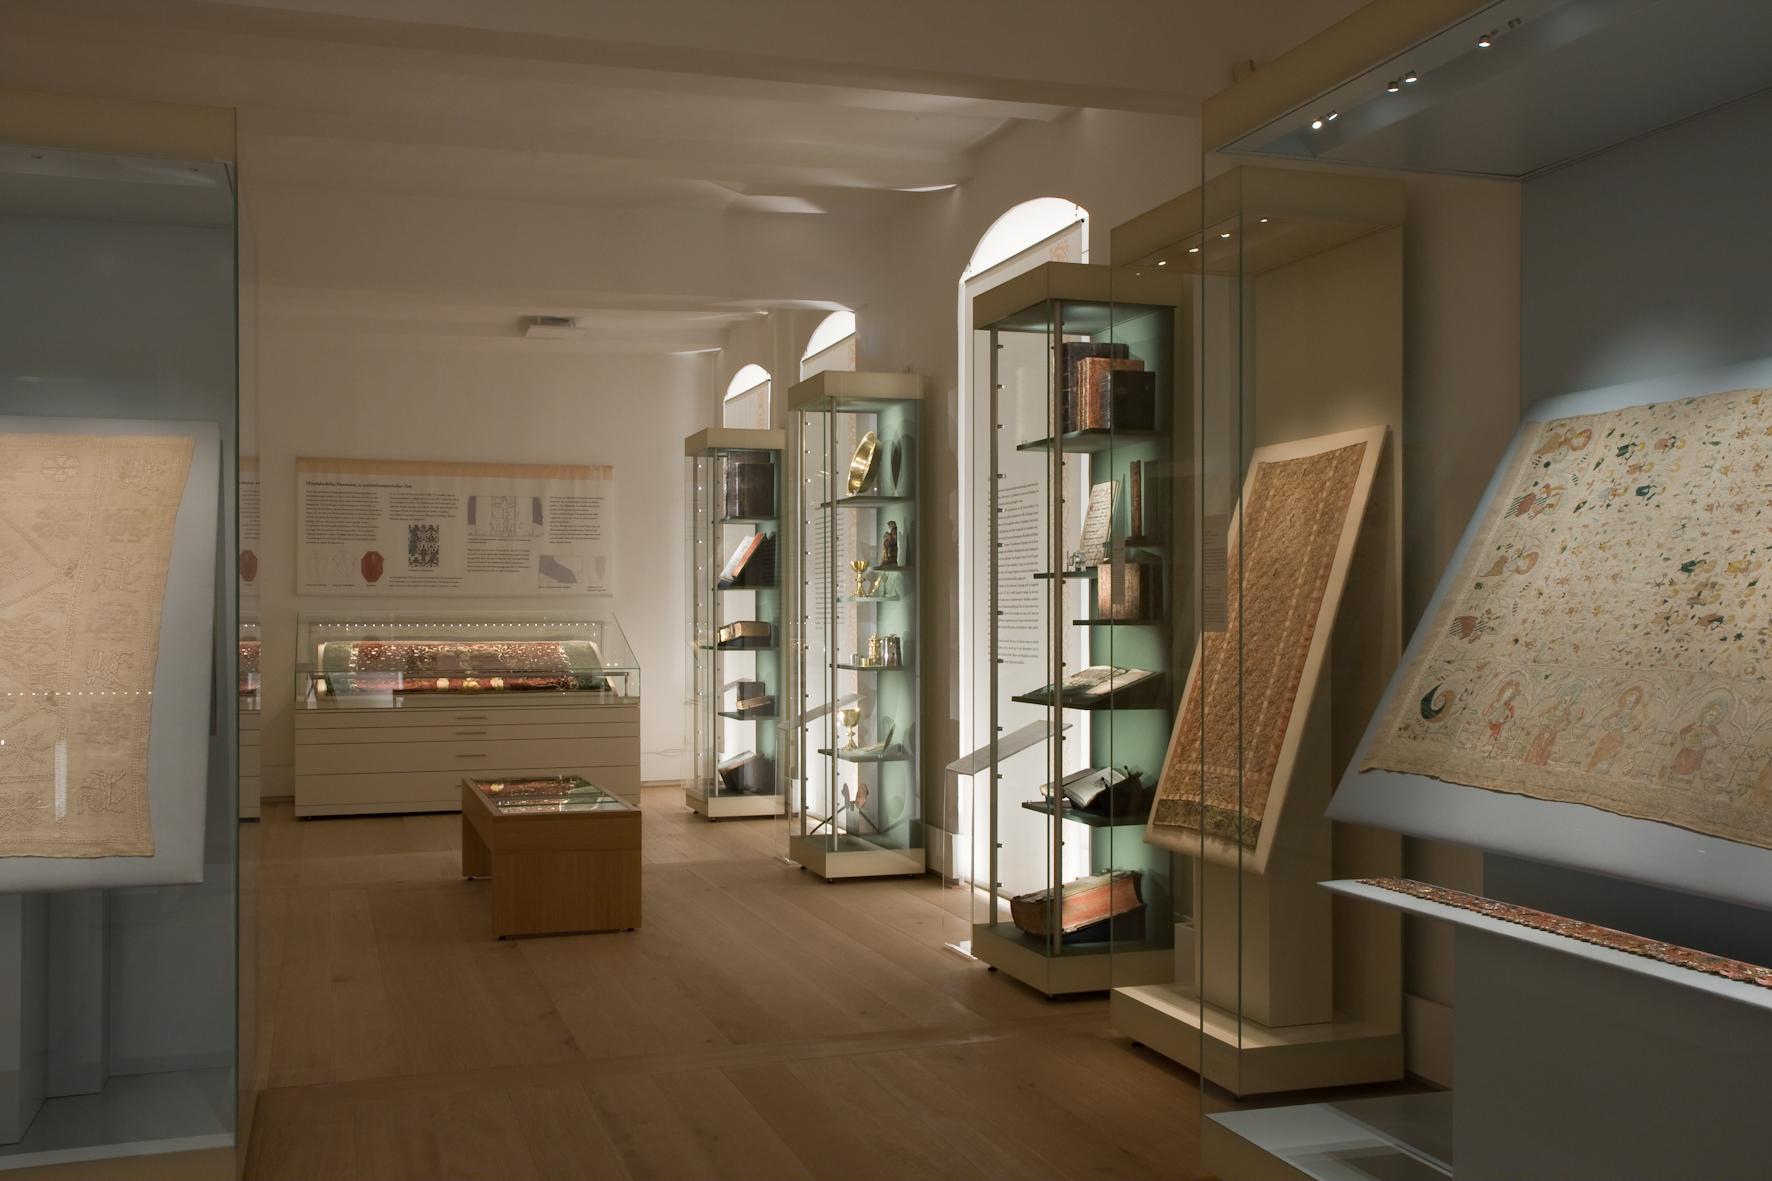 Museum im Kloster Isenhagen